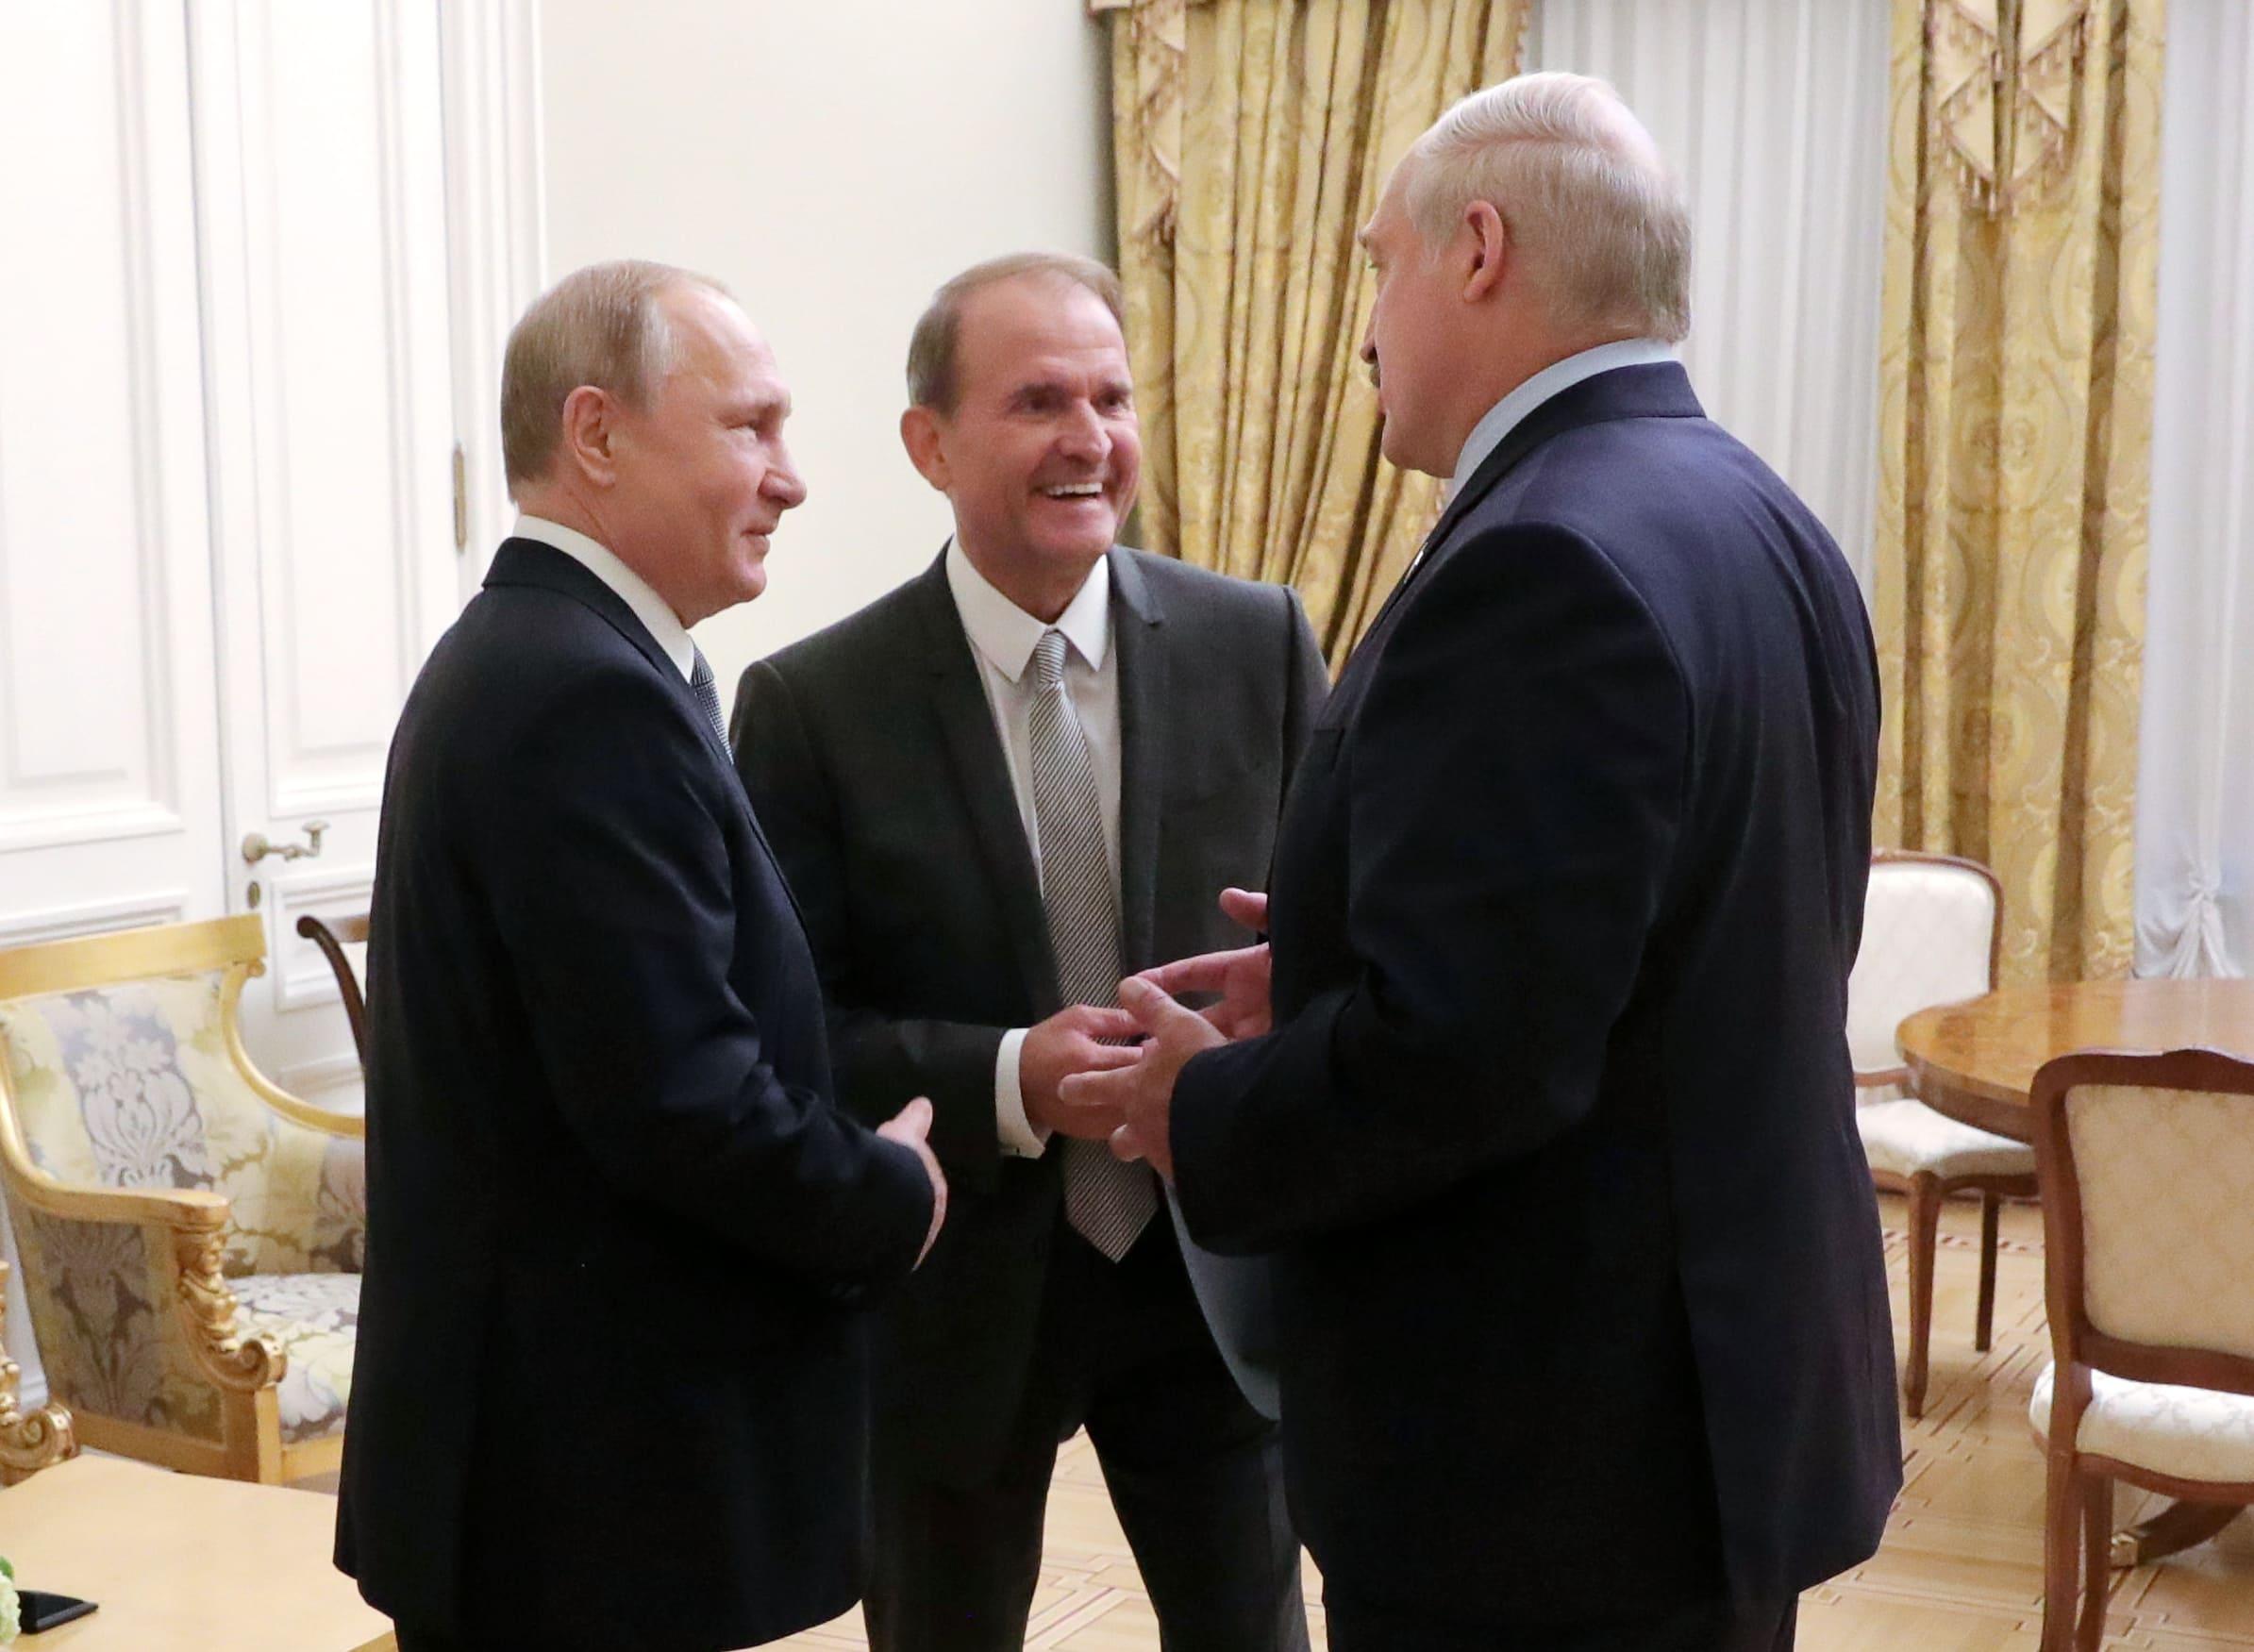 Владимир Путин, Виктор Медведчук и Александр Лукашенко (фото – Михаил Климентьев/EPA)